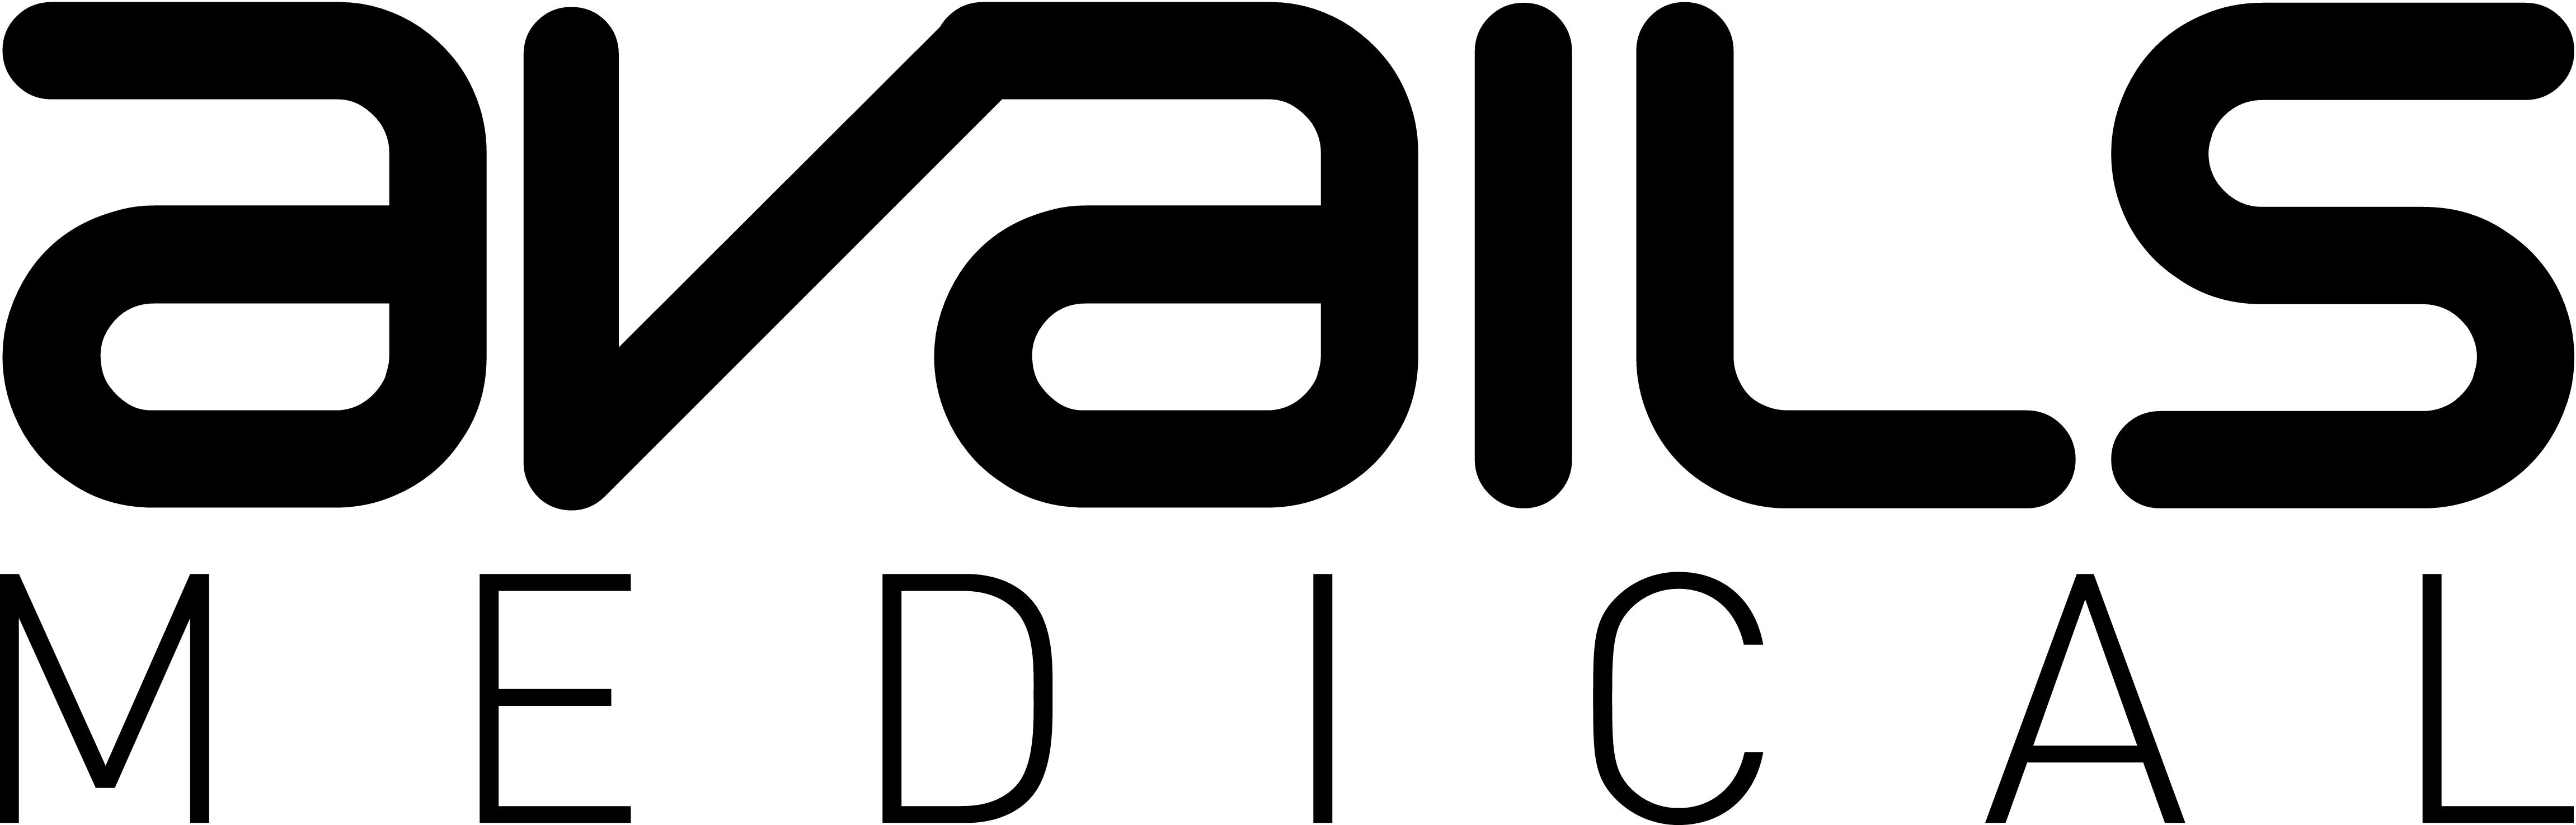 Avails_medical_logo